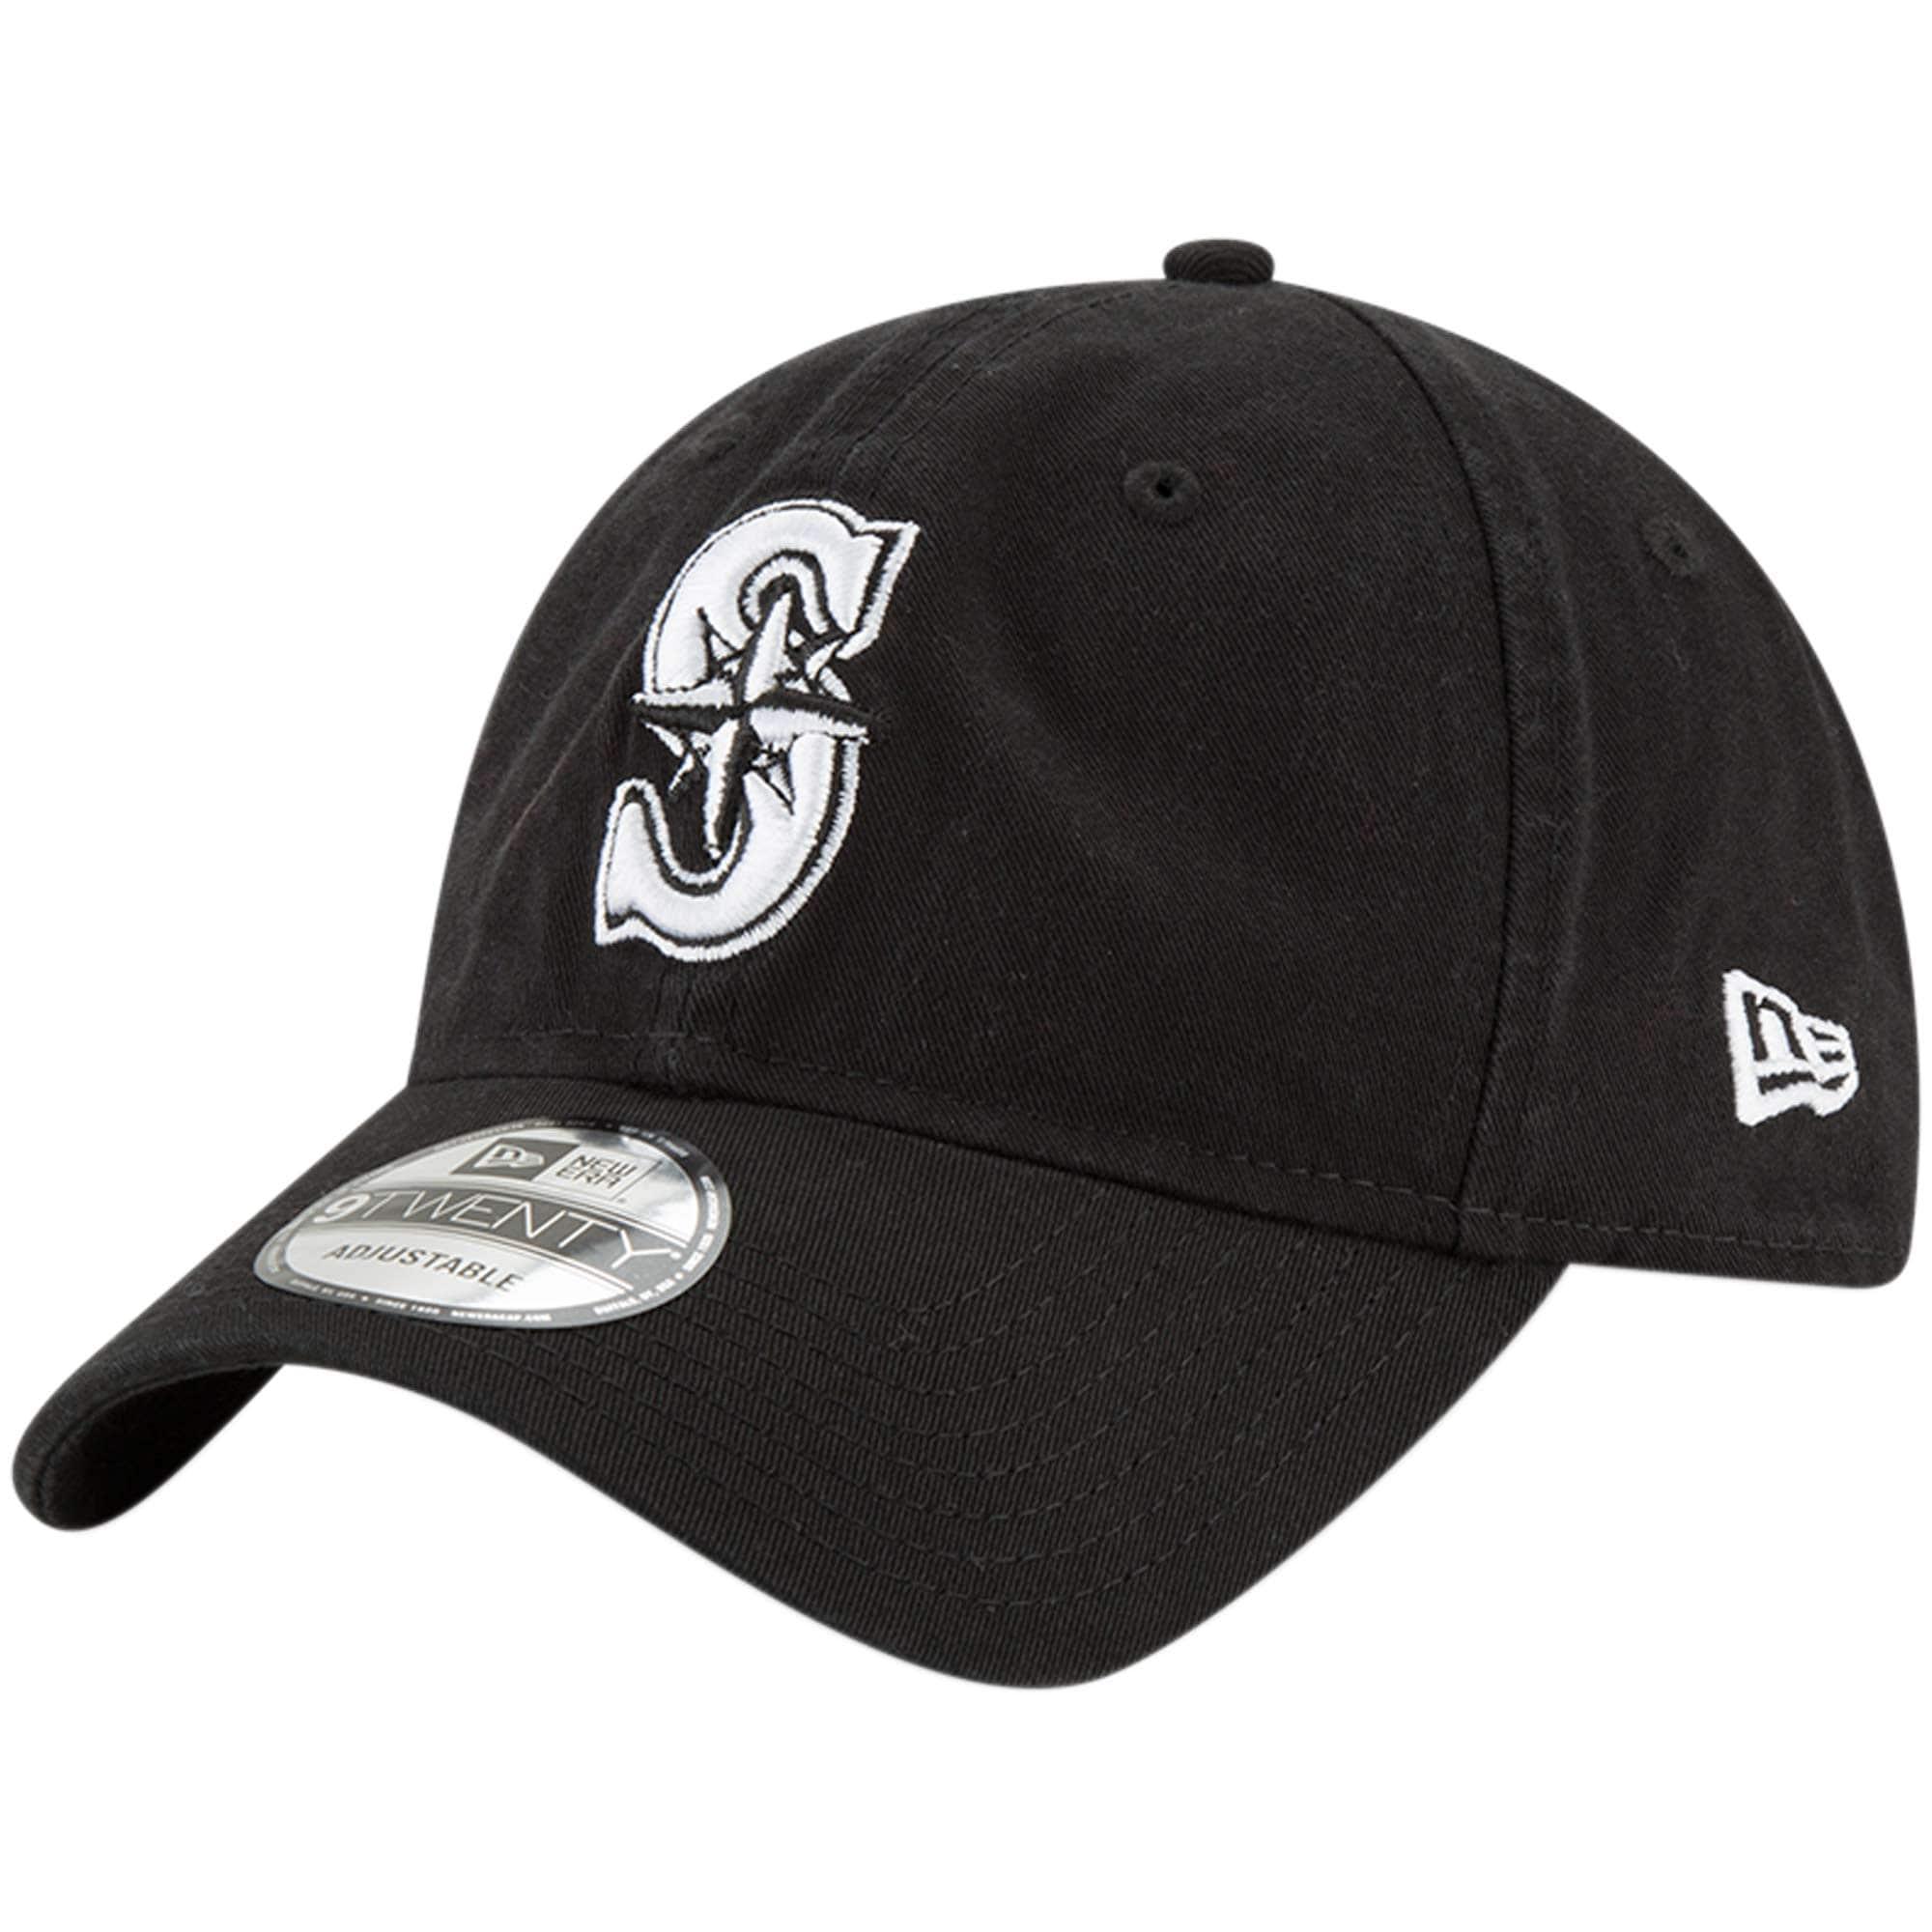 Seattle Mariners New Era Core Classic Twill 9TWENTY Adjustable Hat - Black